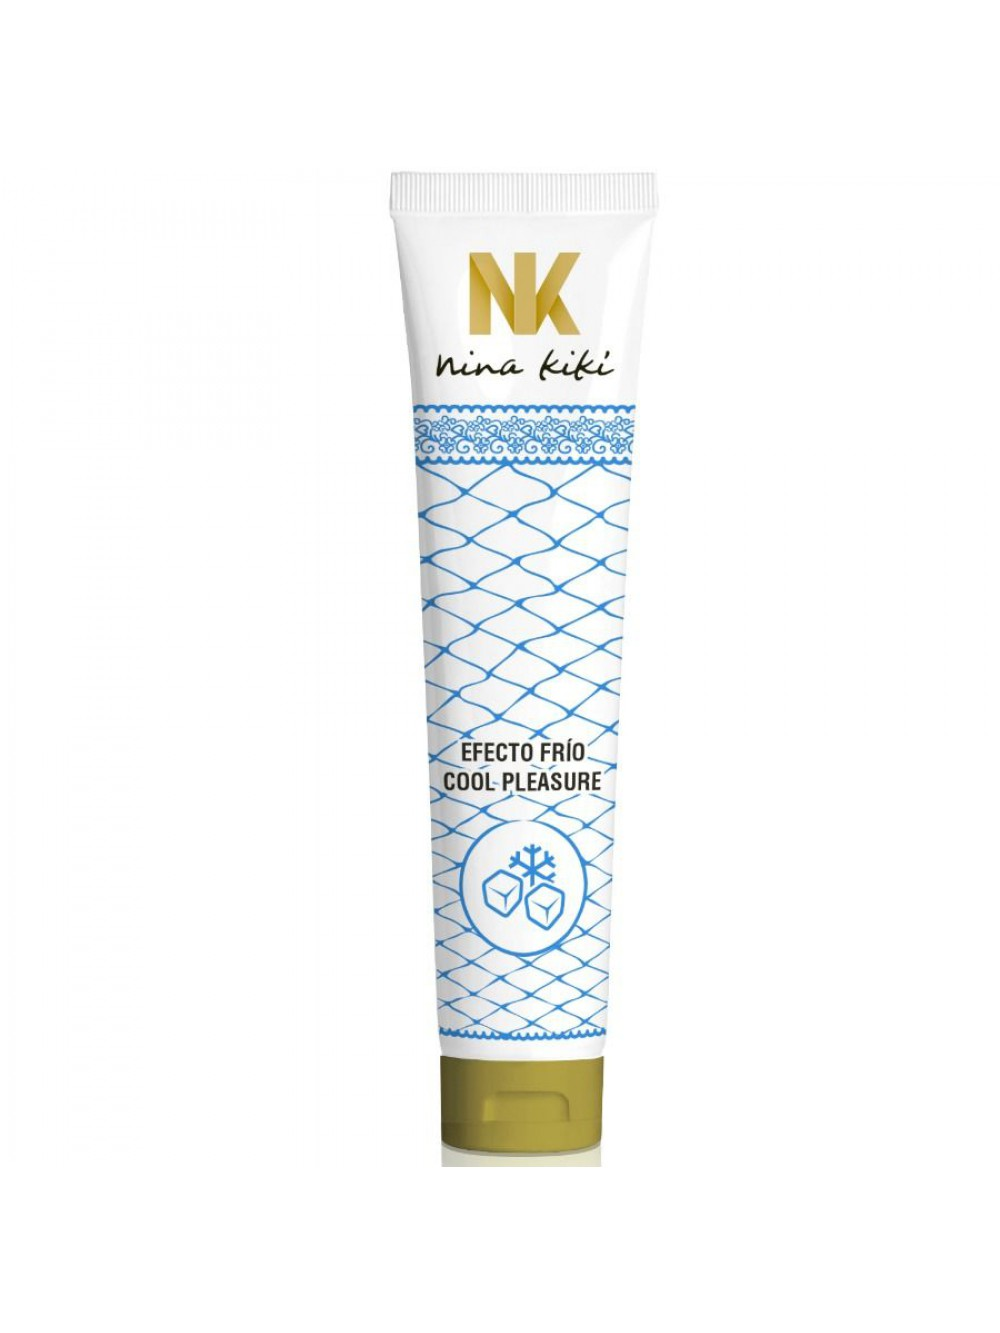 NINA KIKI COOLING EFFECT LUBRICANT 125 ML 8425402155554